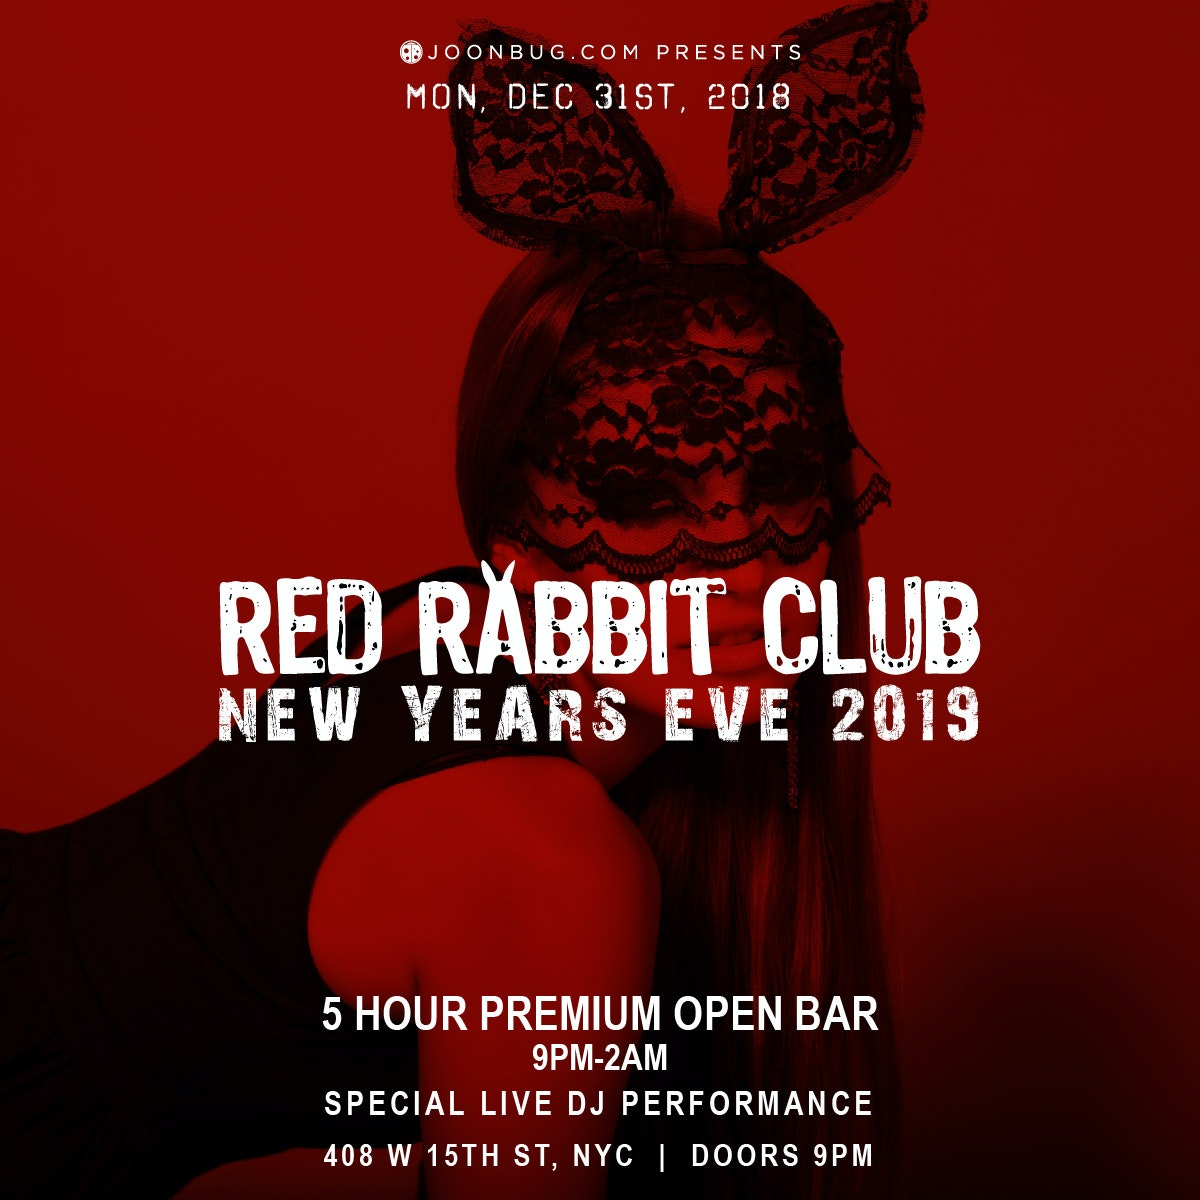 Red Rabbit Club